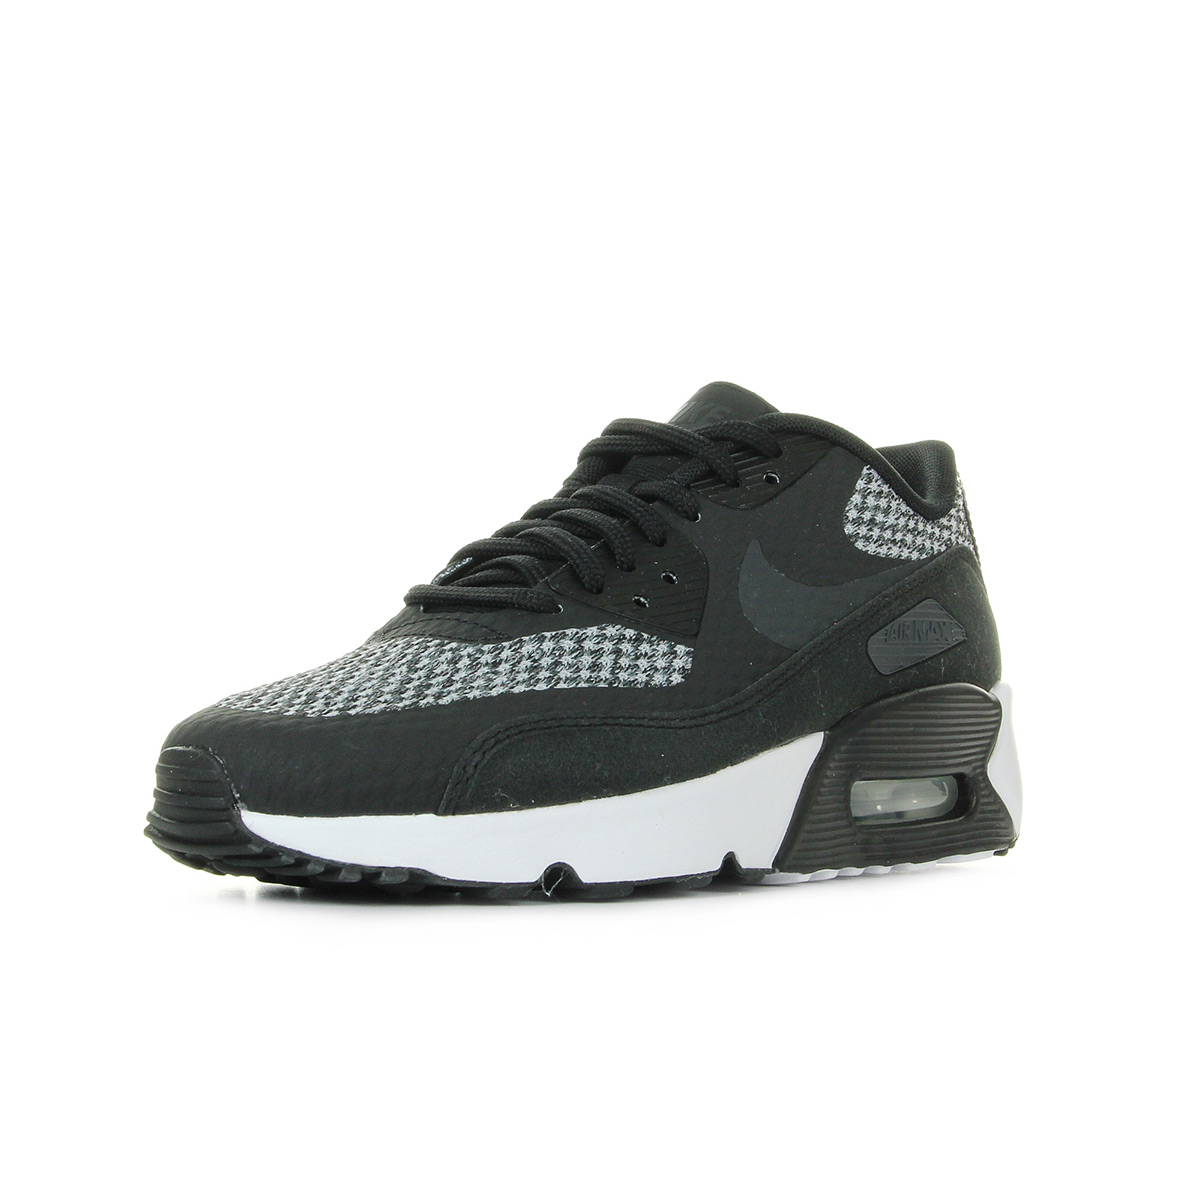 Details zu Schuhe Nike Air Max 90 Ultra 20 SE schwarz